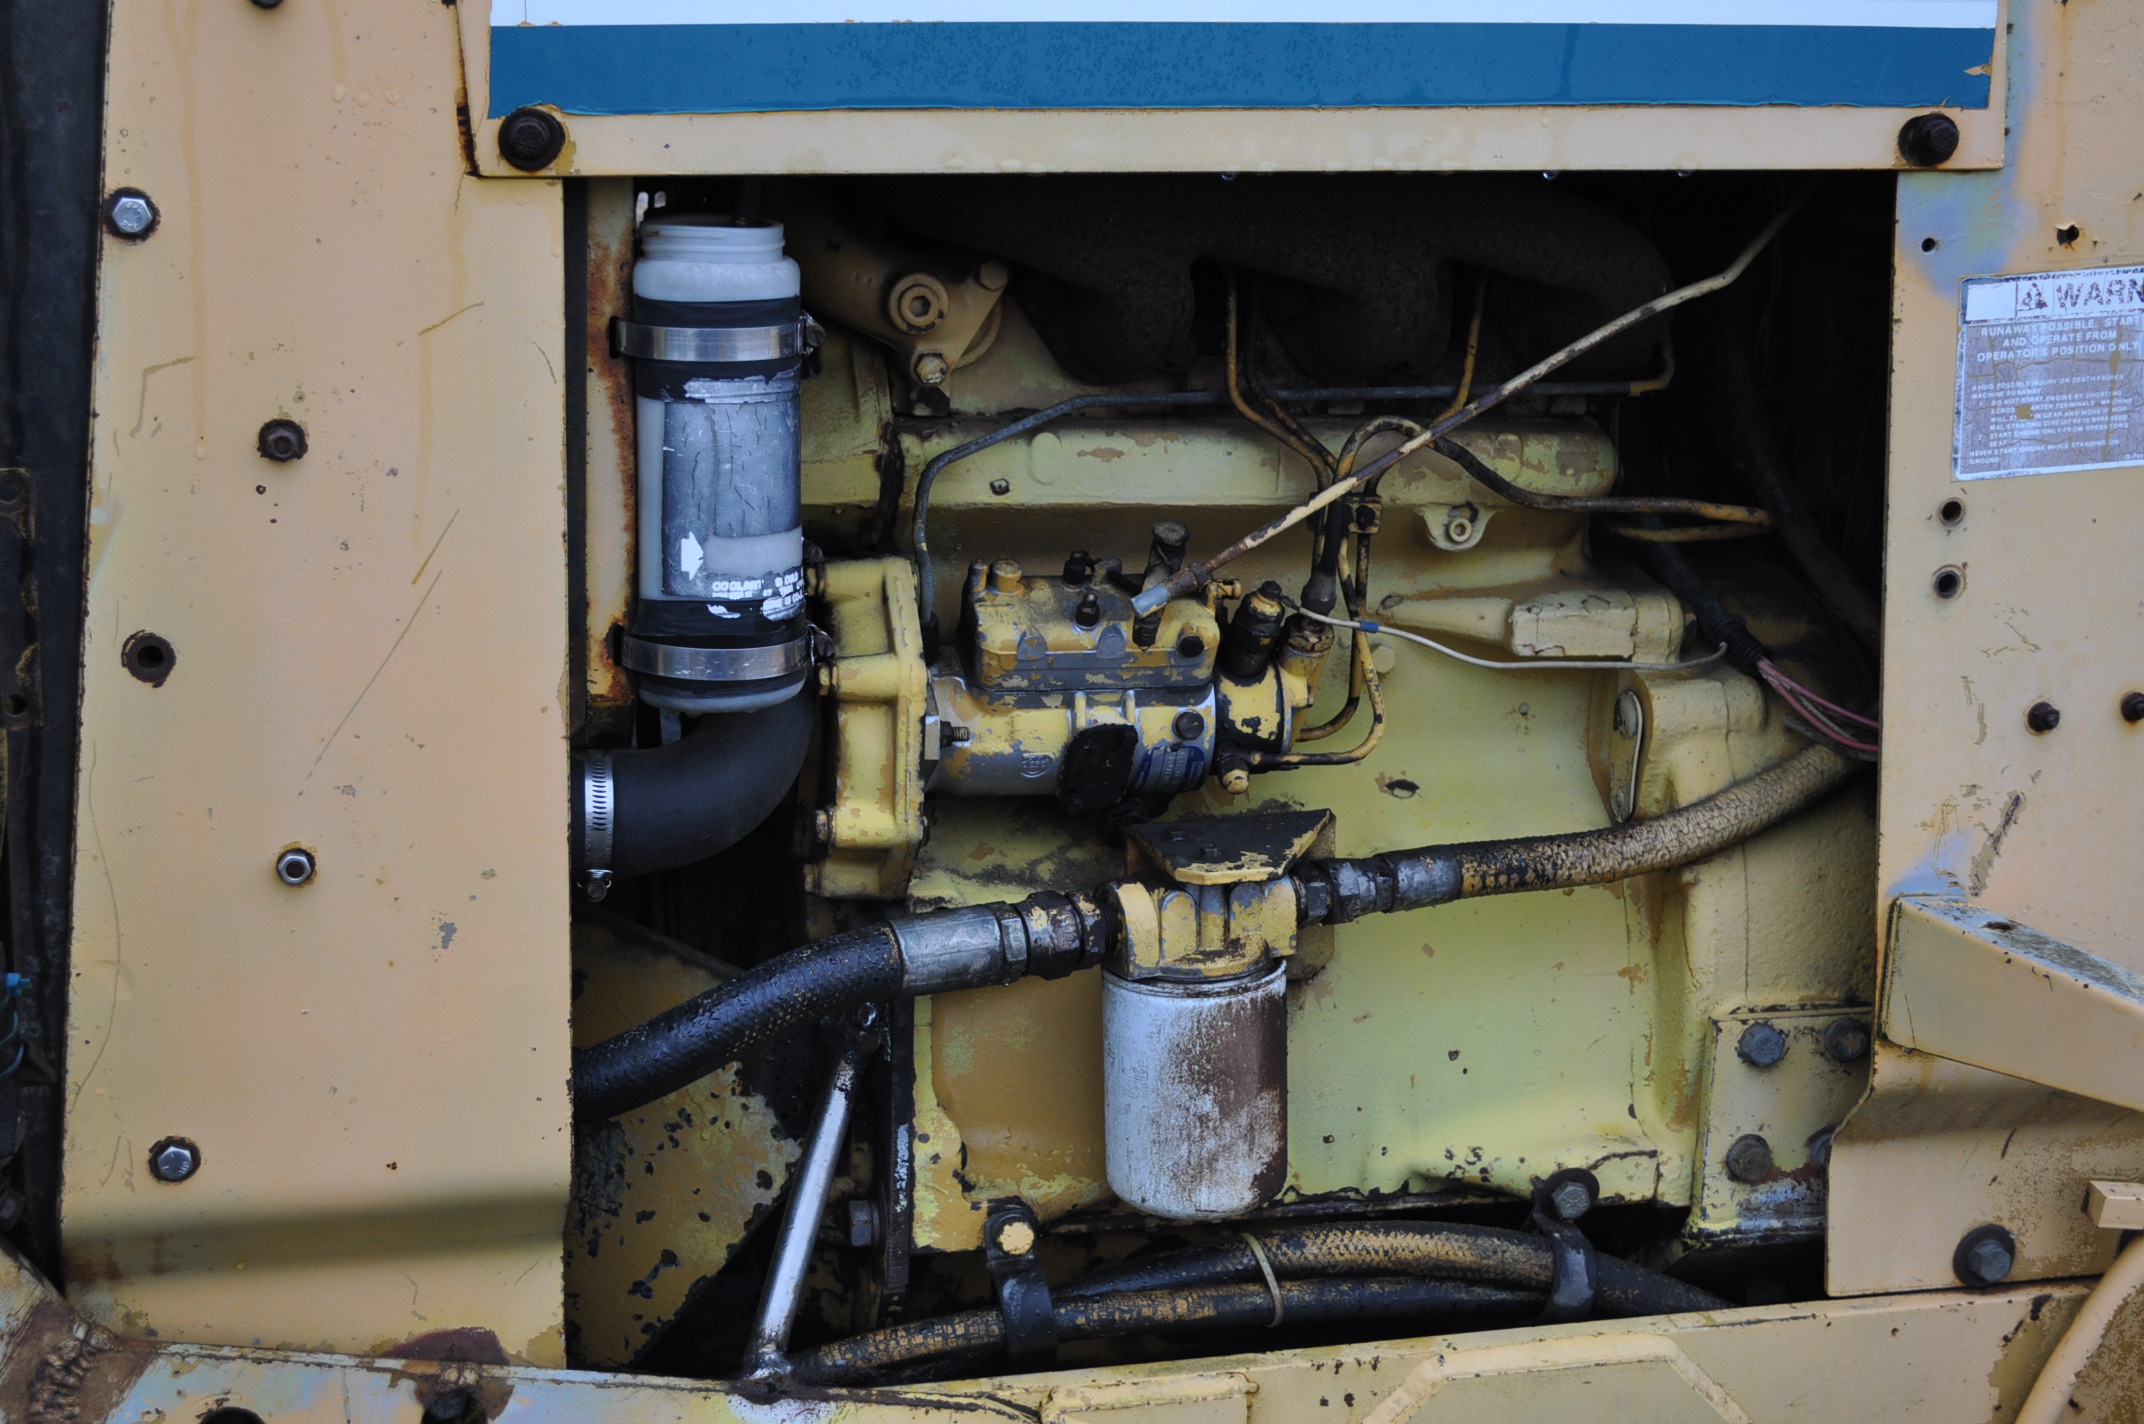 Vermeer V450 Trencher, parts machine, backhoe attachment, JD diesel, SN 1VRF082L2H1000460 - Image 5 of 15